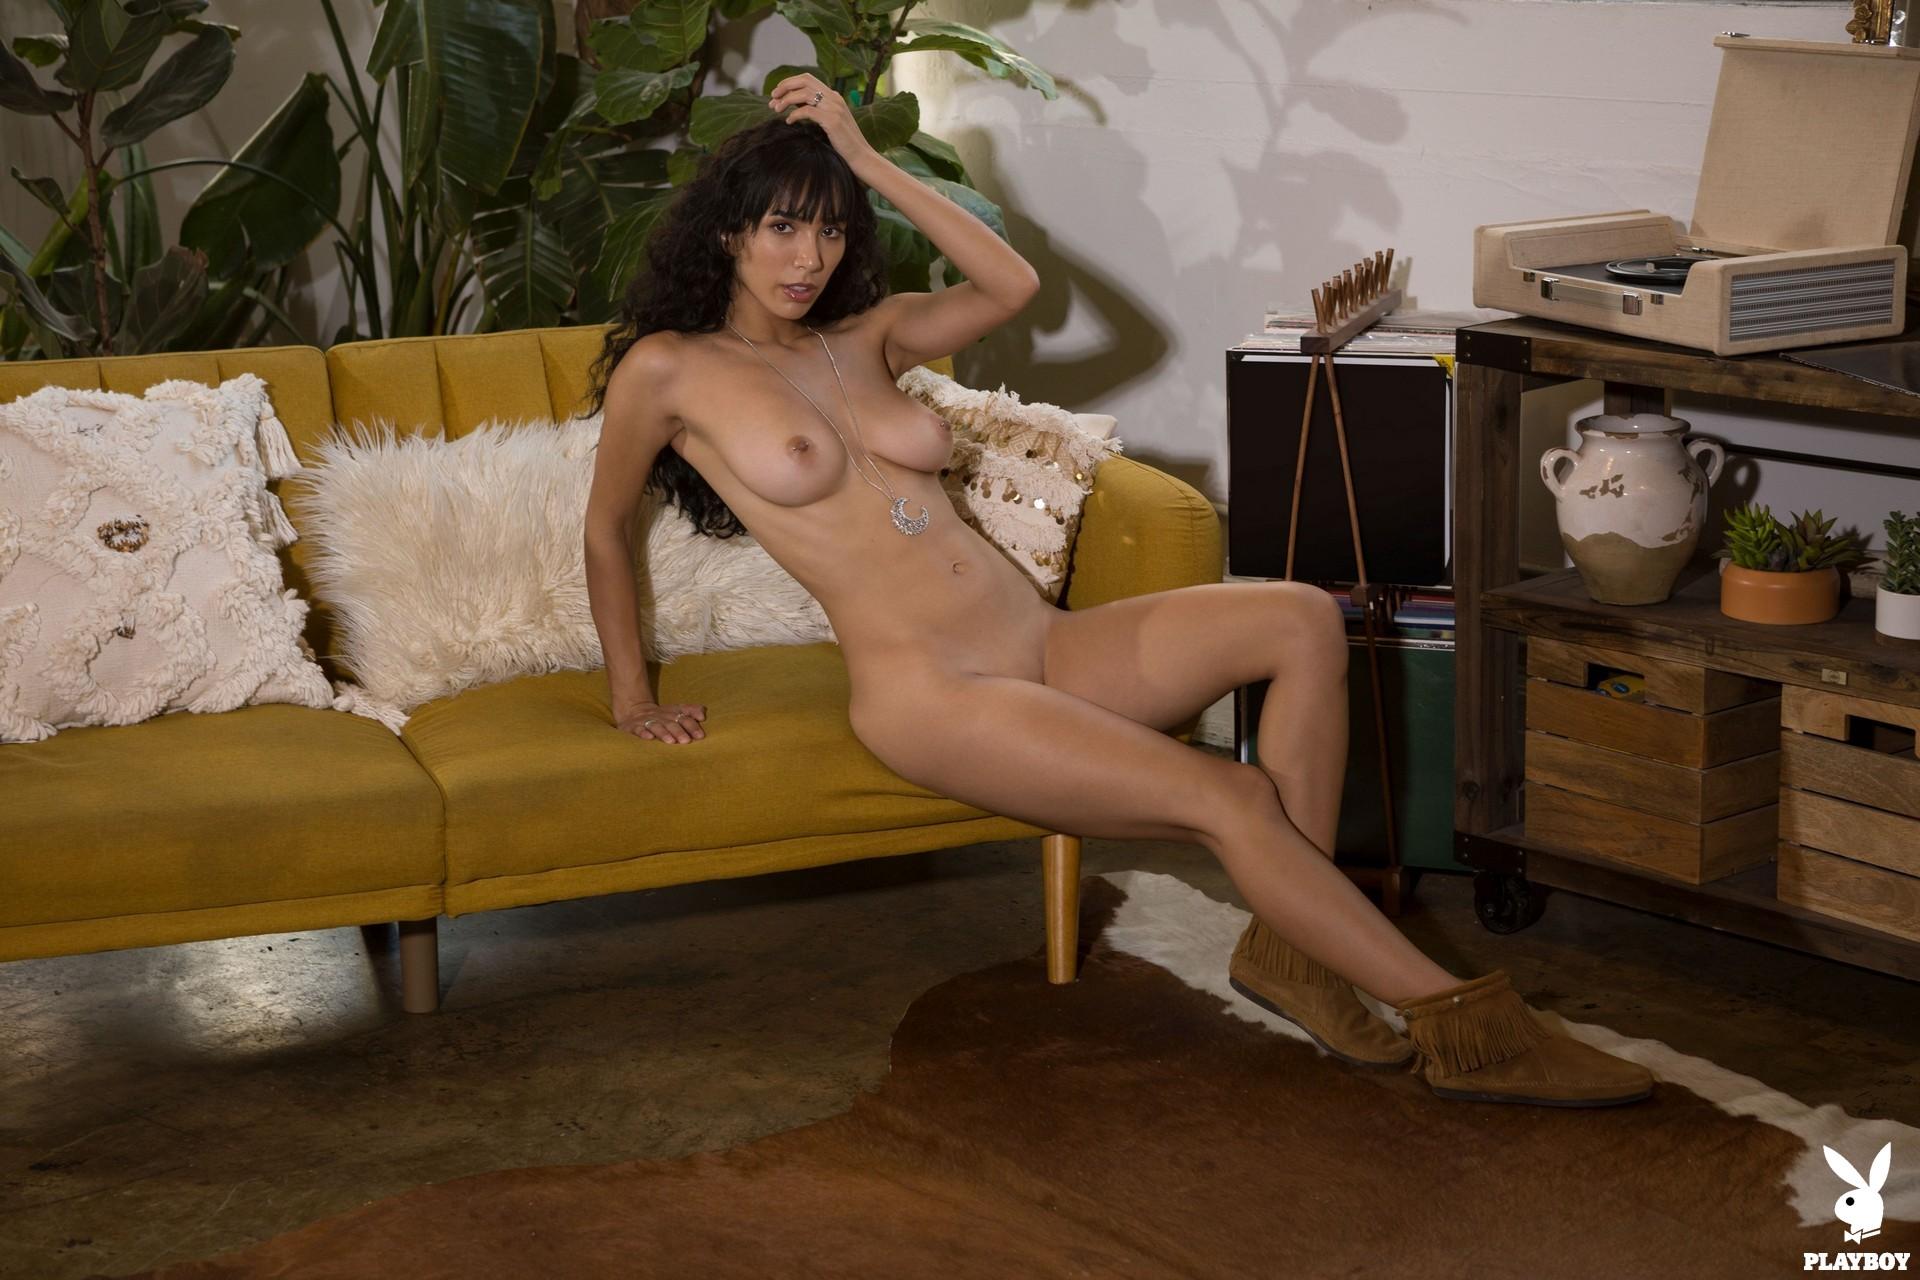 Erika De Leija in Funky and Free - Playboy Plus 2